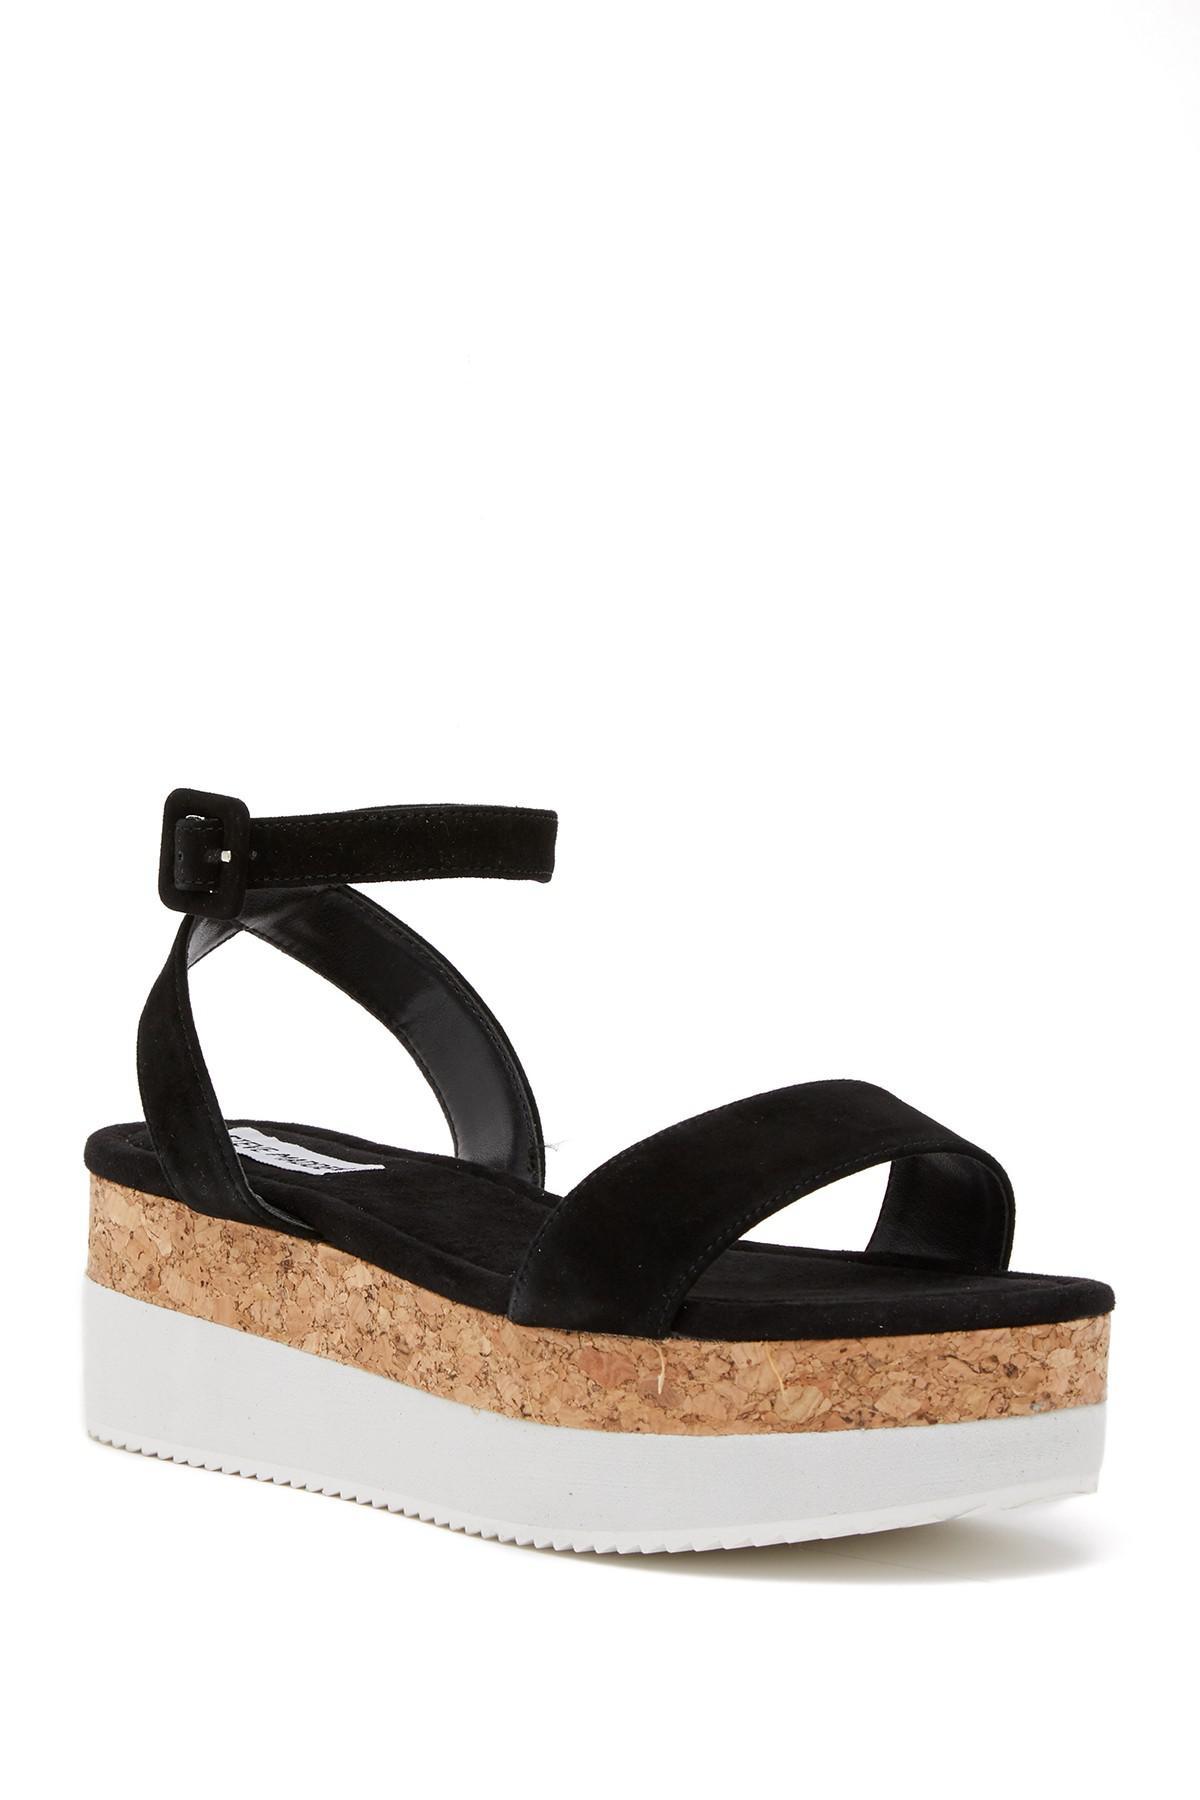 1133fcf65bf Lyst - Steve Madden Bodhi Platform Ankle Strap Sandal in Black